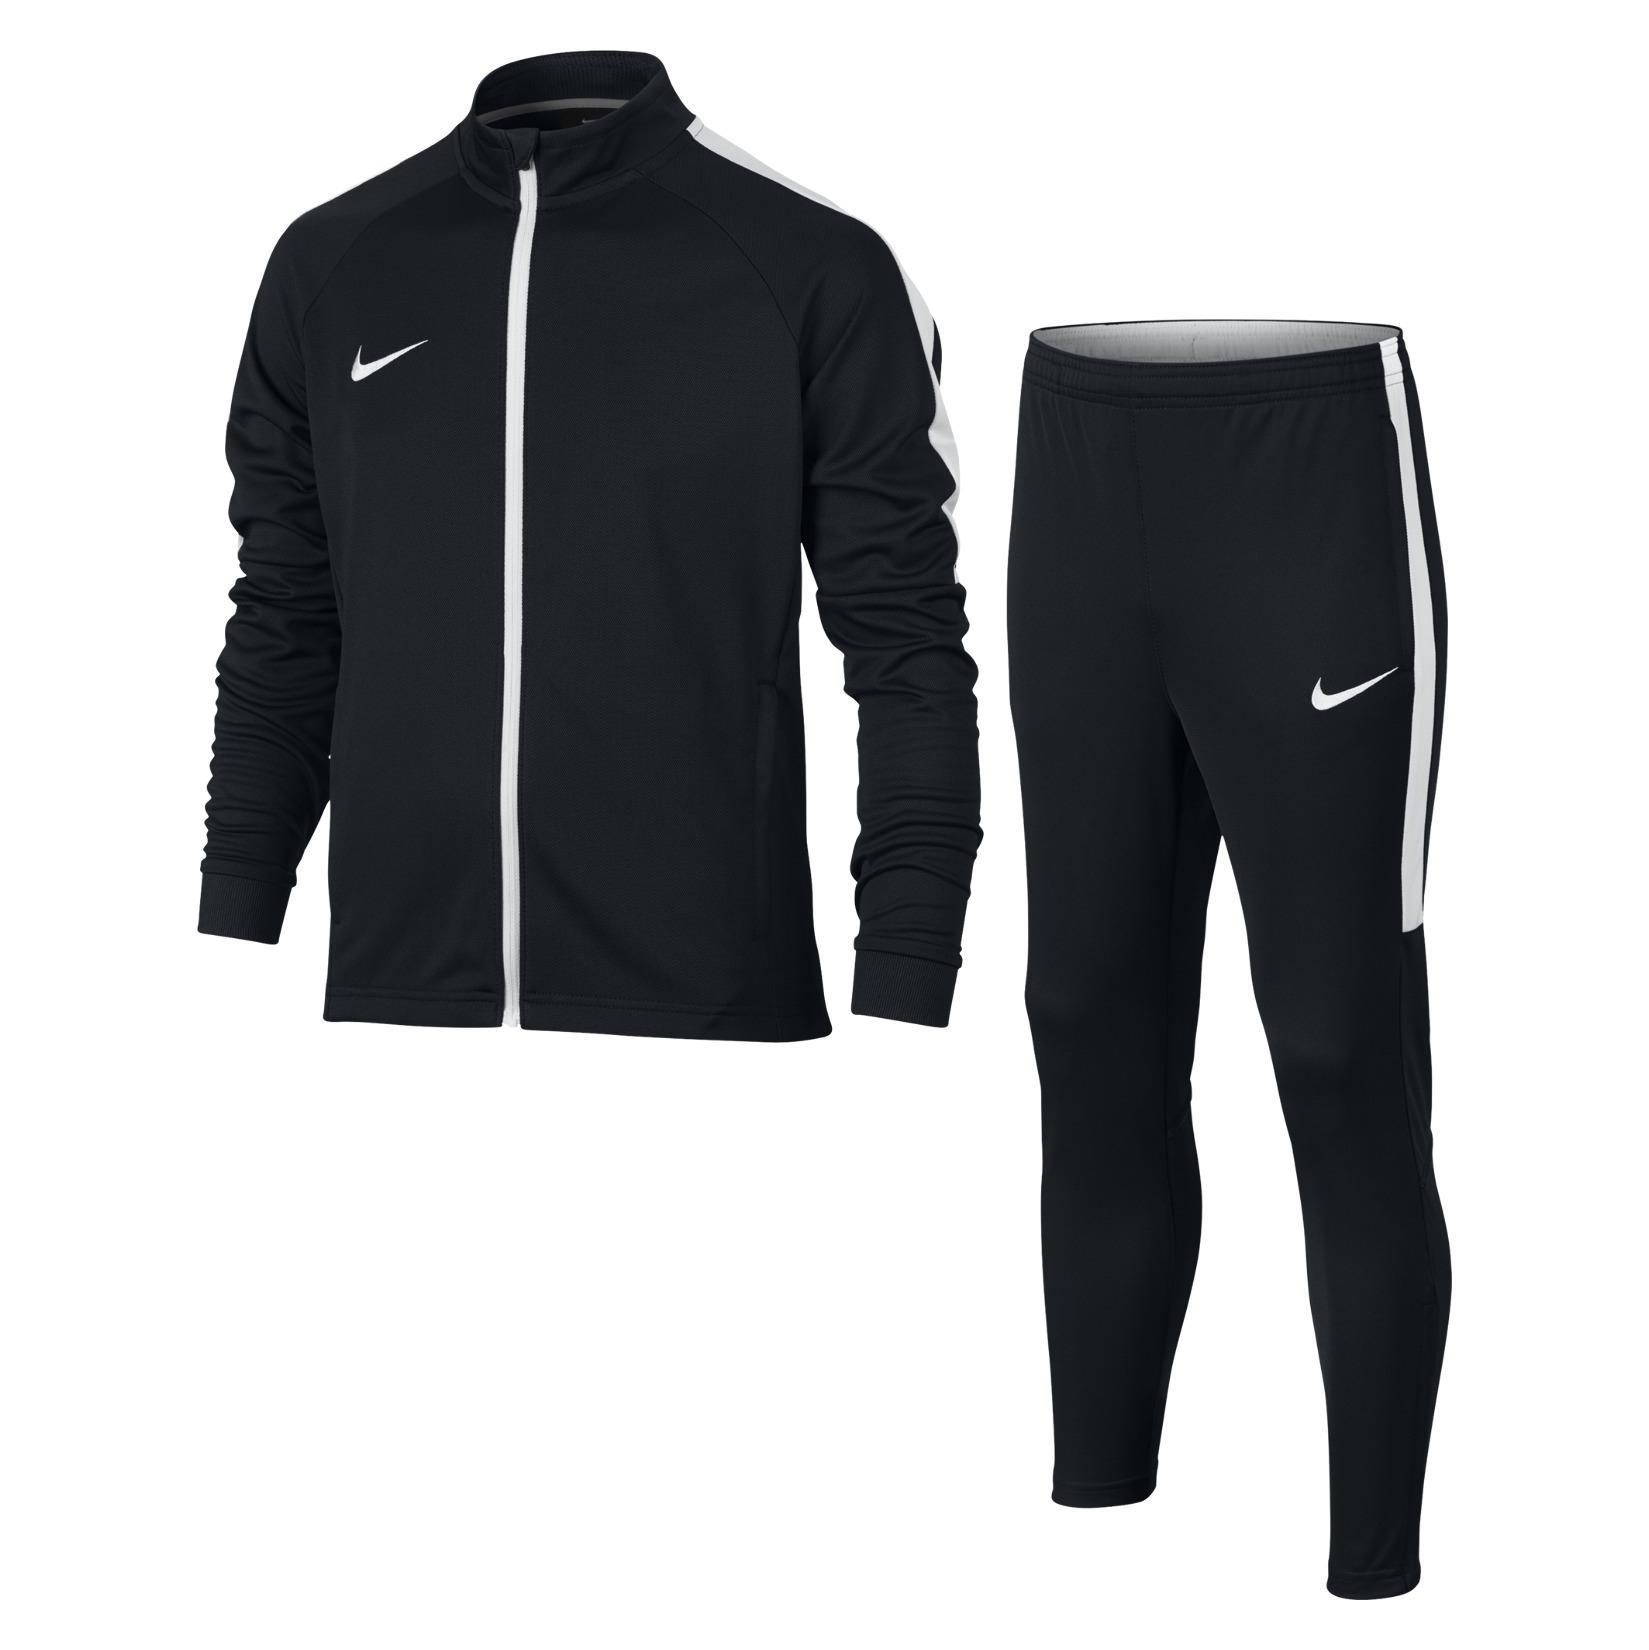 Nike Academy Dry KIDS Tracksuit - £31.50 + £3.45 shipping @ Kitlocker